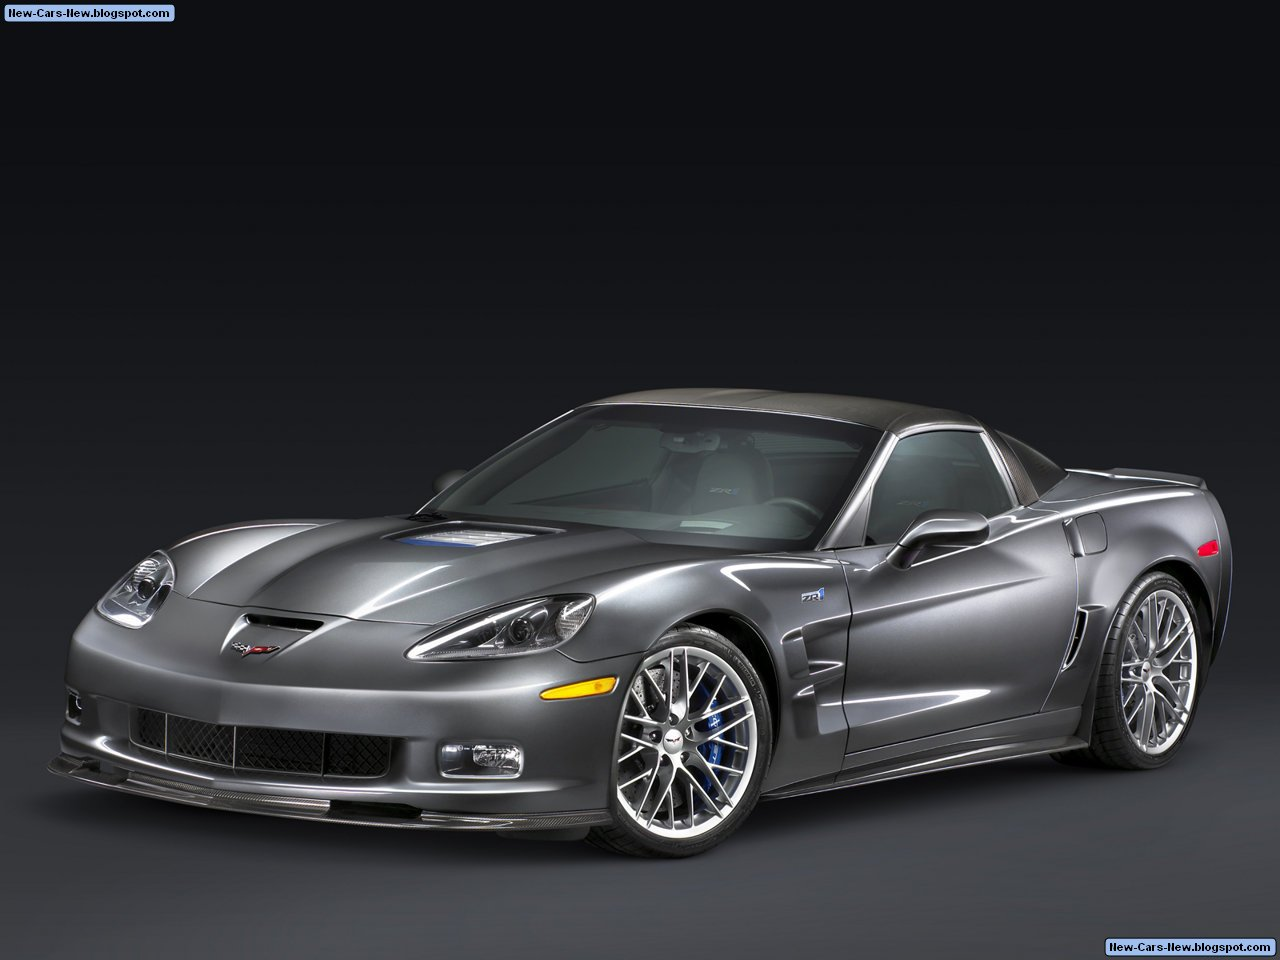 http://4.bp.blogspot.com/_U4w592tUDHM/TDybHiaLC9I/AAAAAAAAEPk/Lk4XUm-GasY/s1600/Chevrolet-Corvette_ZR1_2009_1280x960_wallpaper_02.jpg